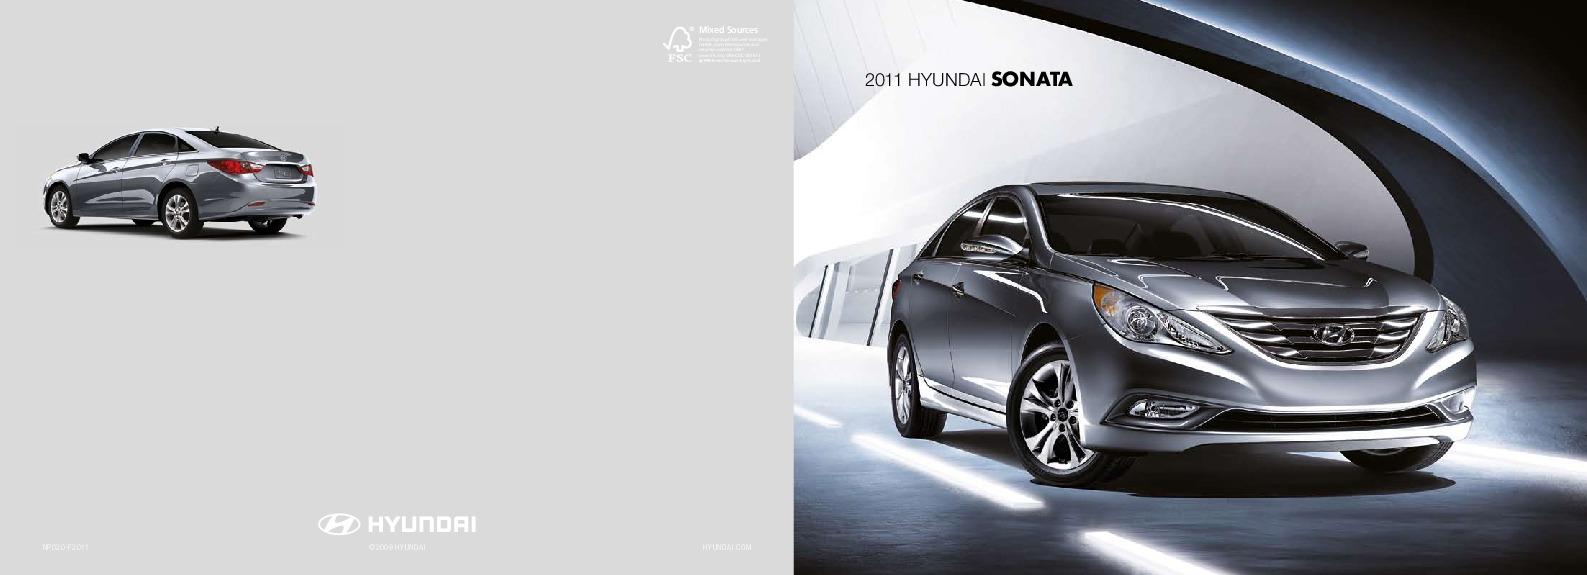 2011 hyundai sonata 2 4l gls se limited hyundai i45 catalogue brochure rh auto filemanual com Hyundai I40 Sedan Hyundai I30